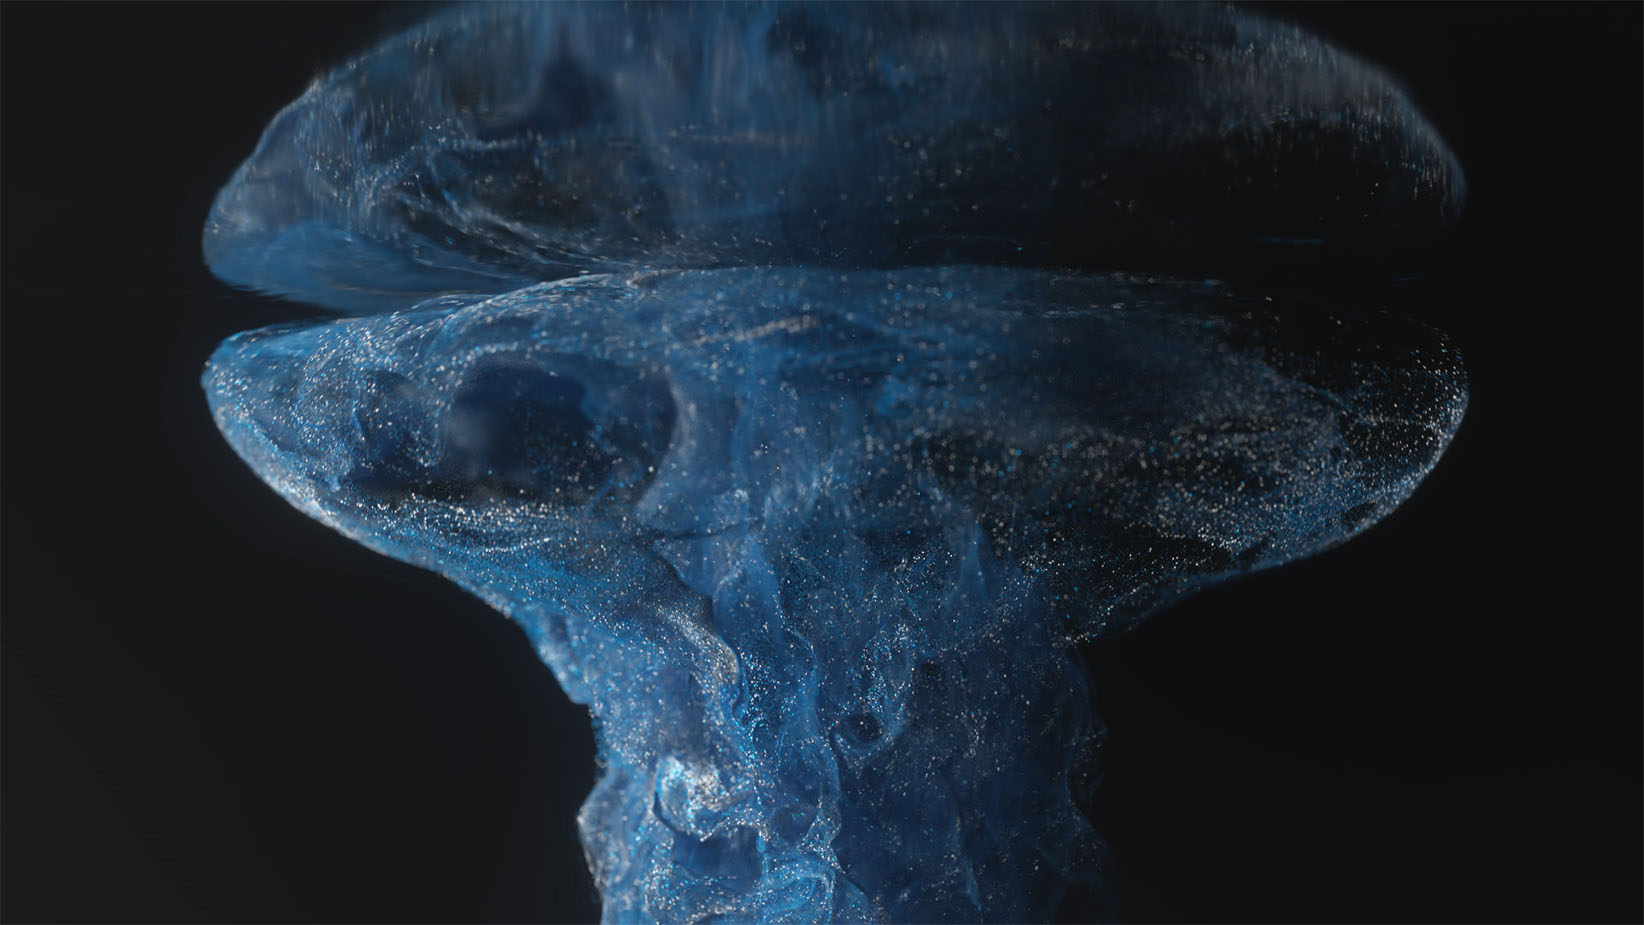 AOID_DR_Particles_v02